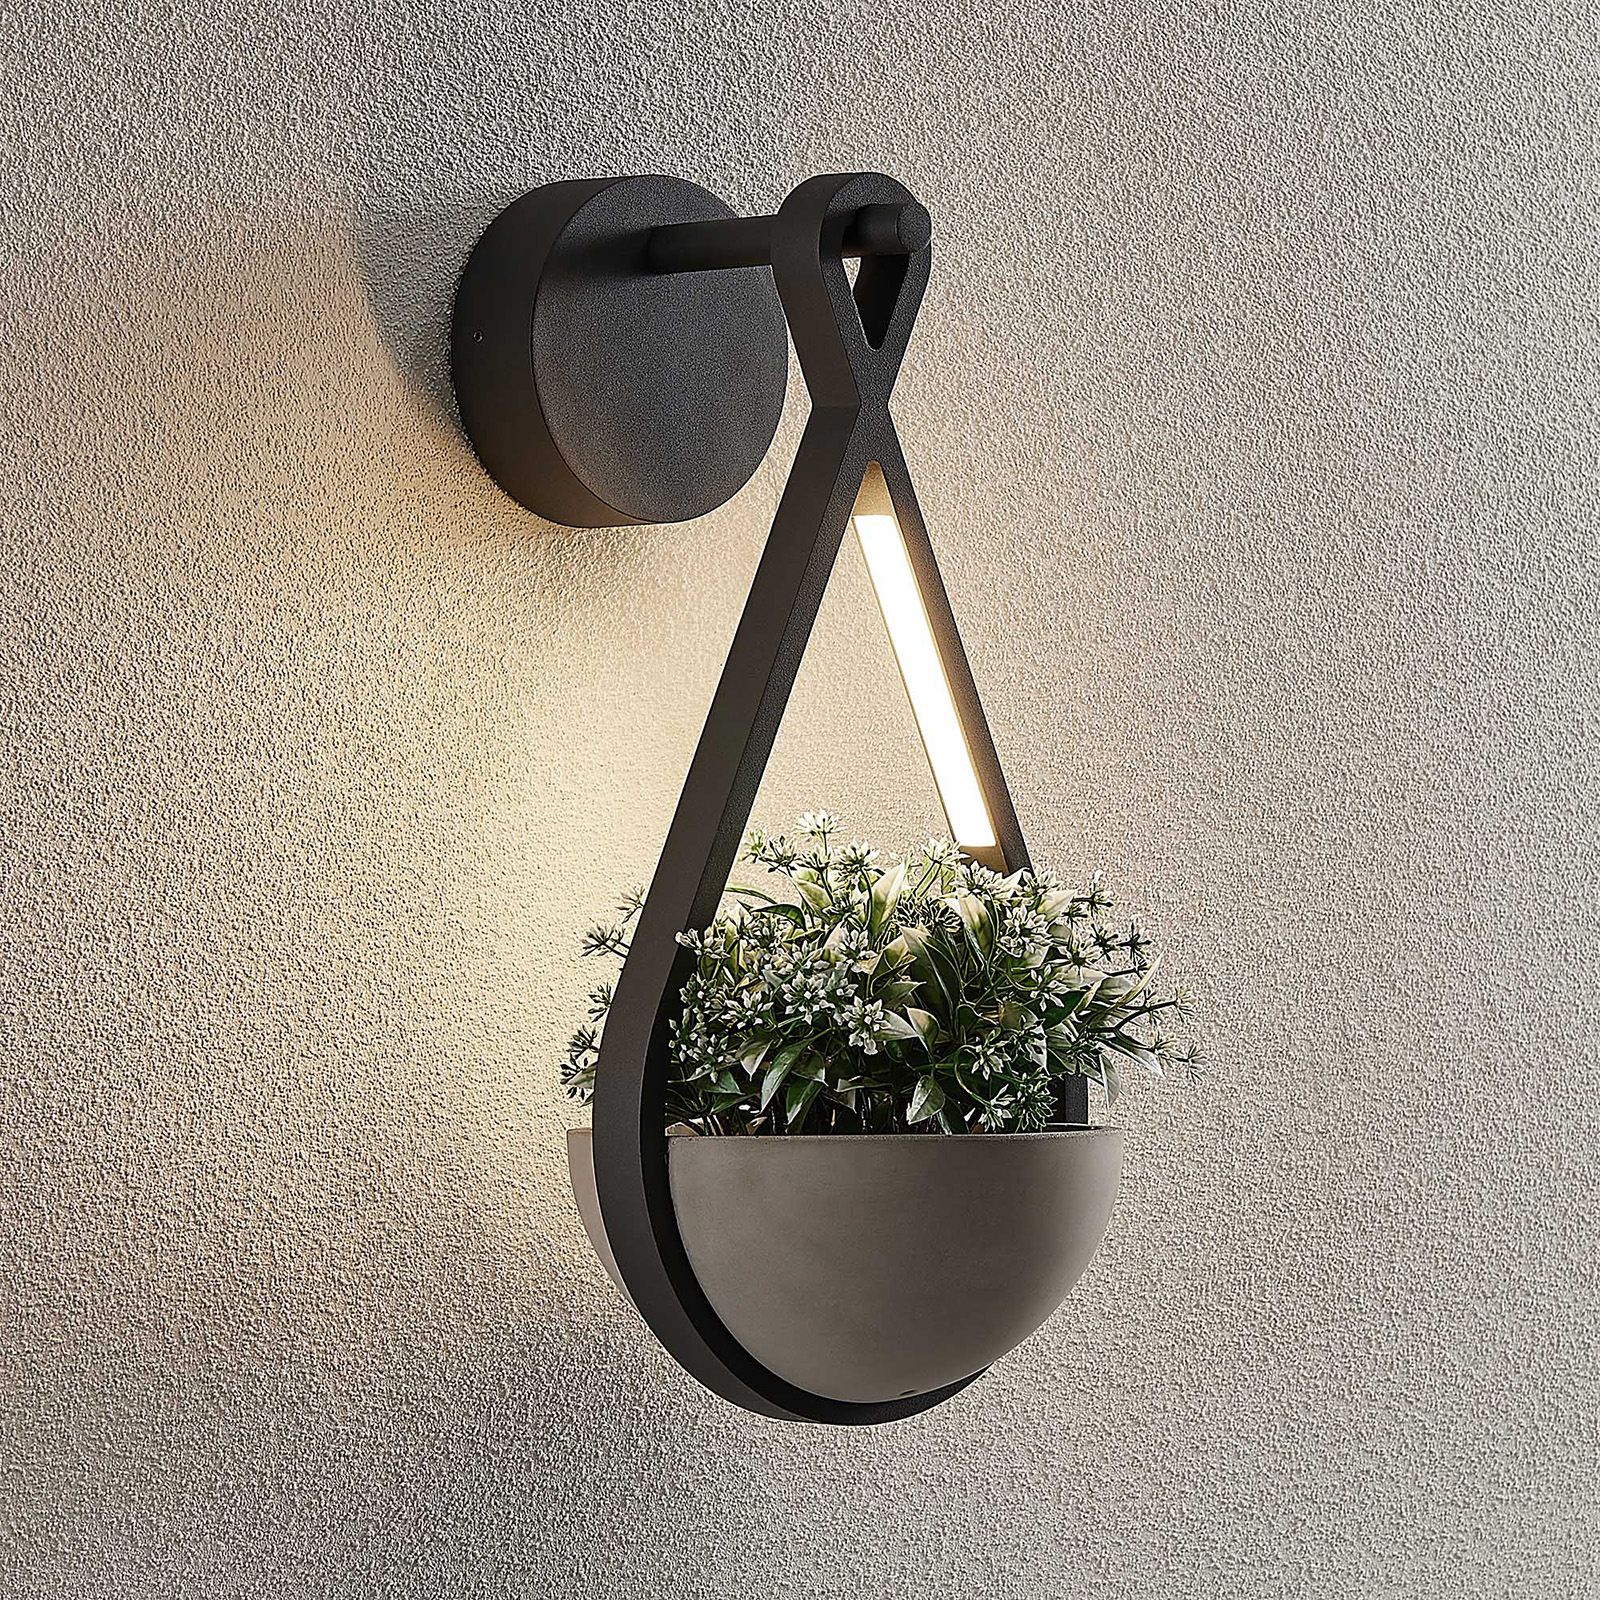 Lucande Florka utendørs LED-vegglampe